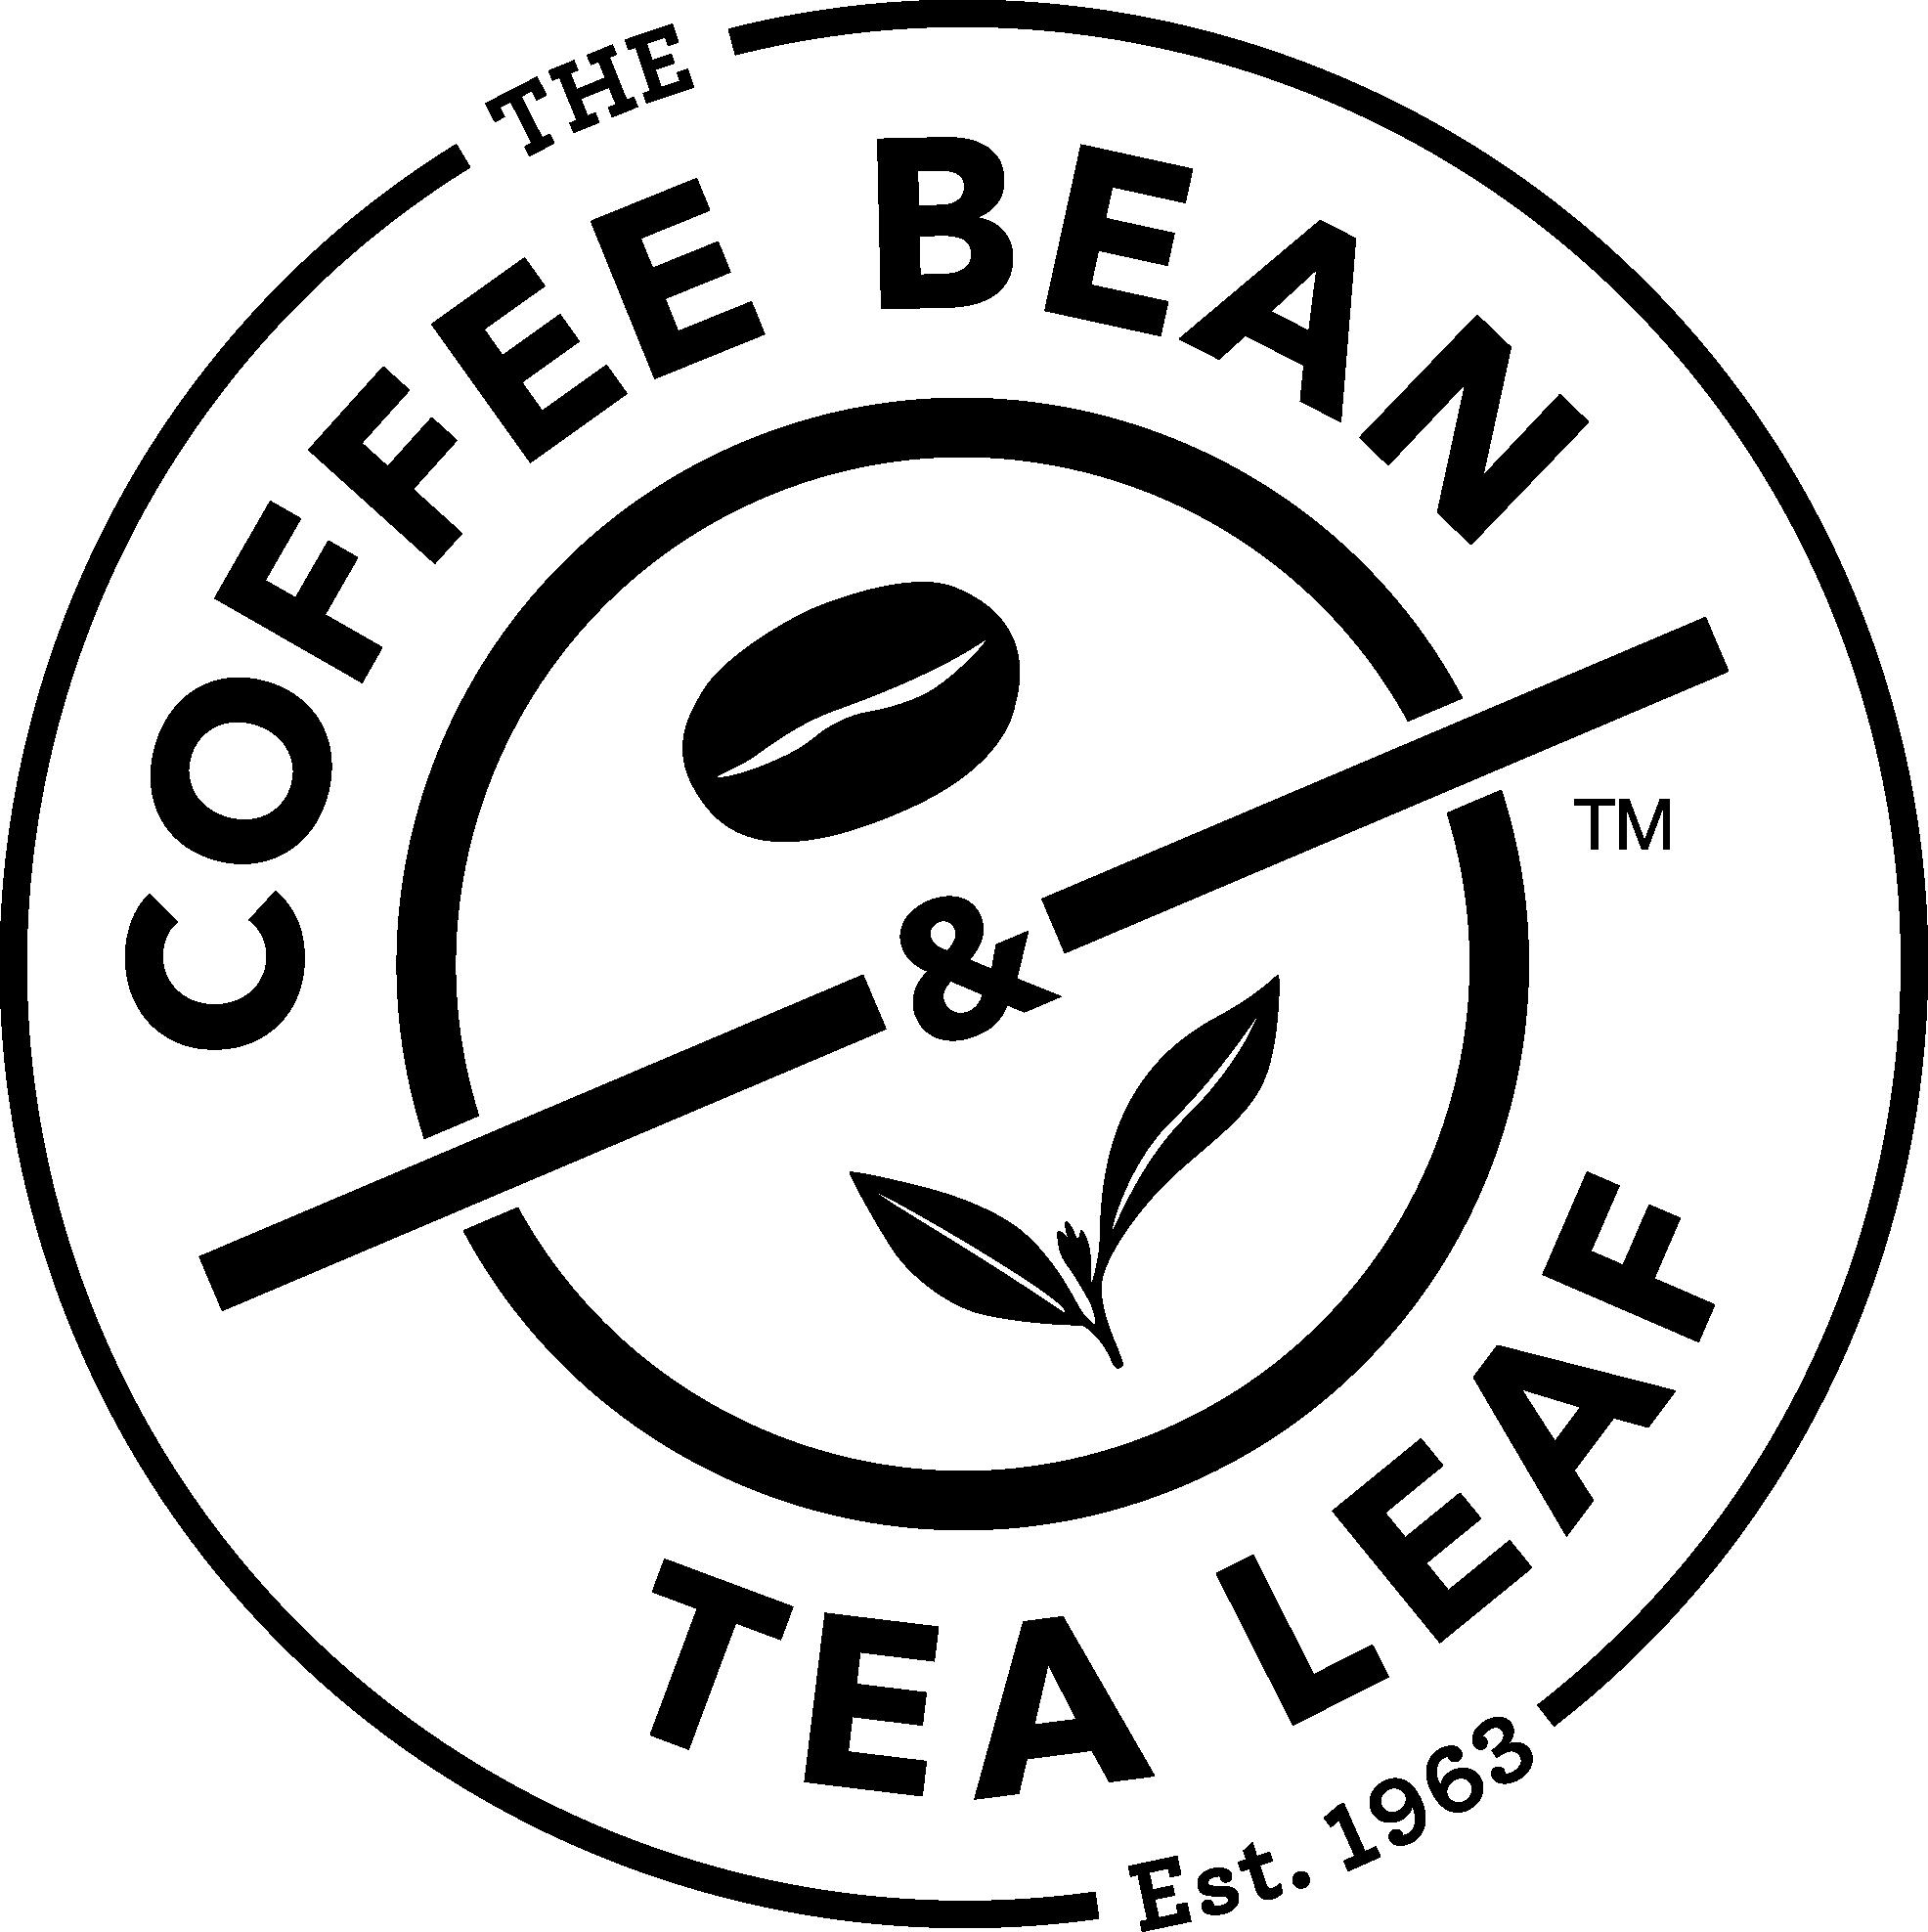 Cbtl Logo Stamp Black Mwdtsa